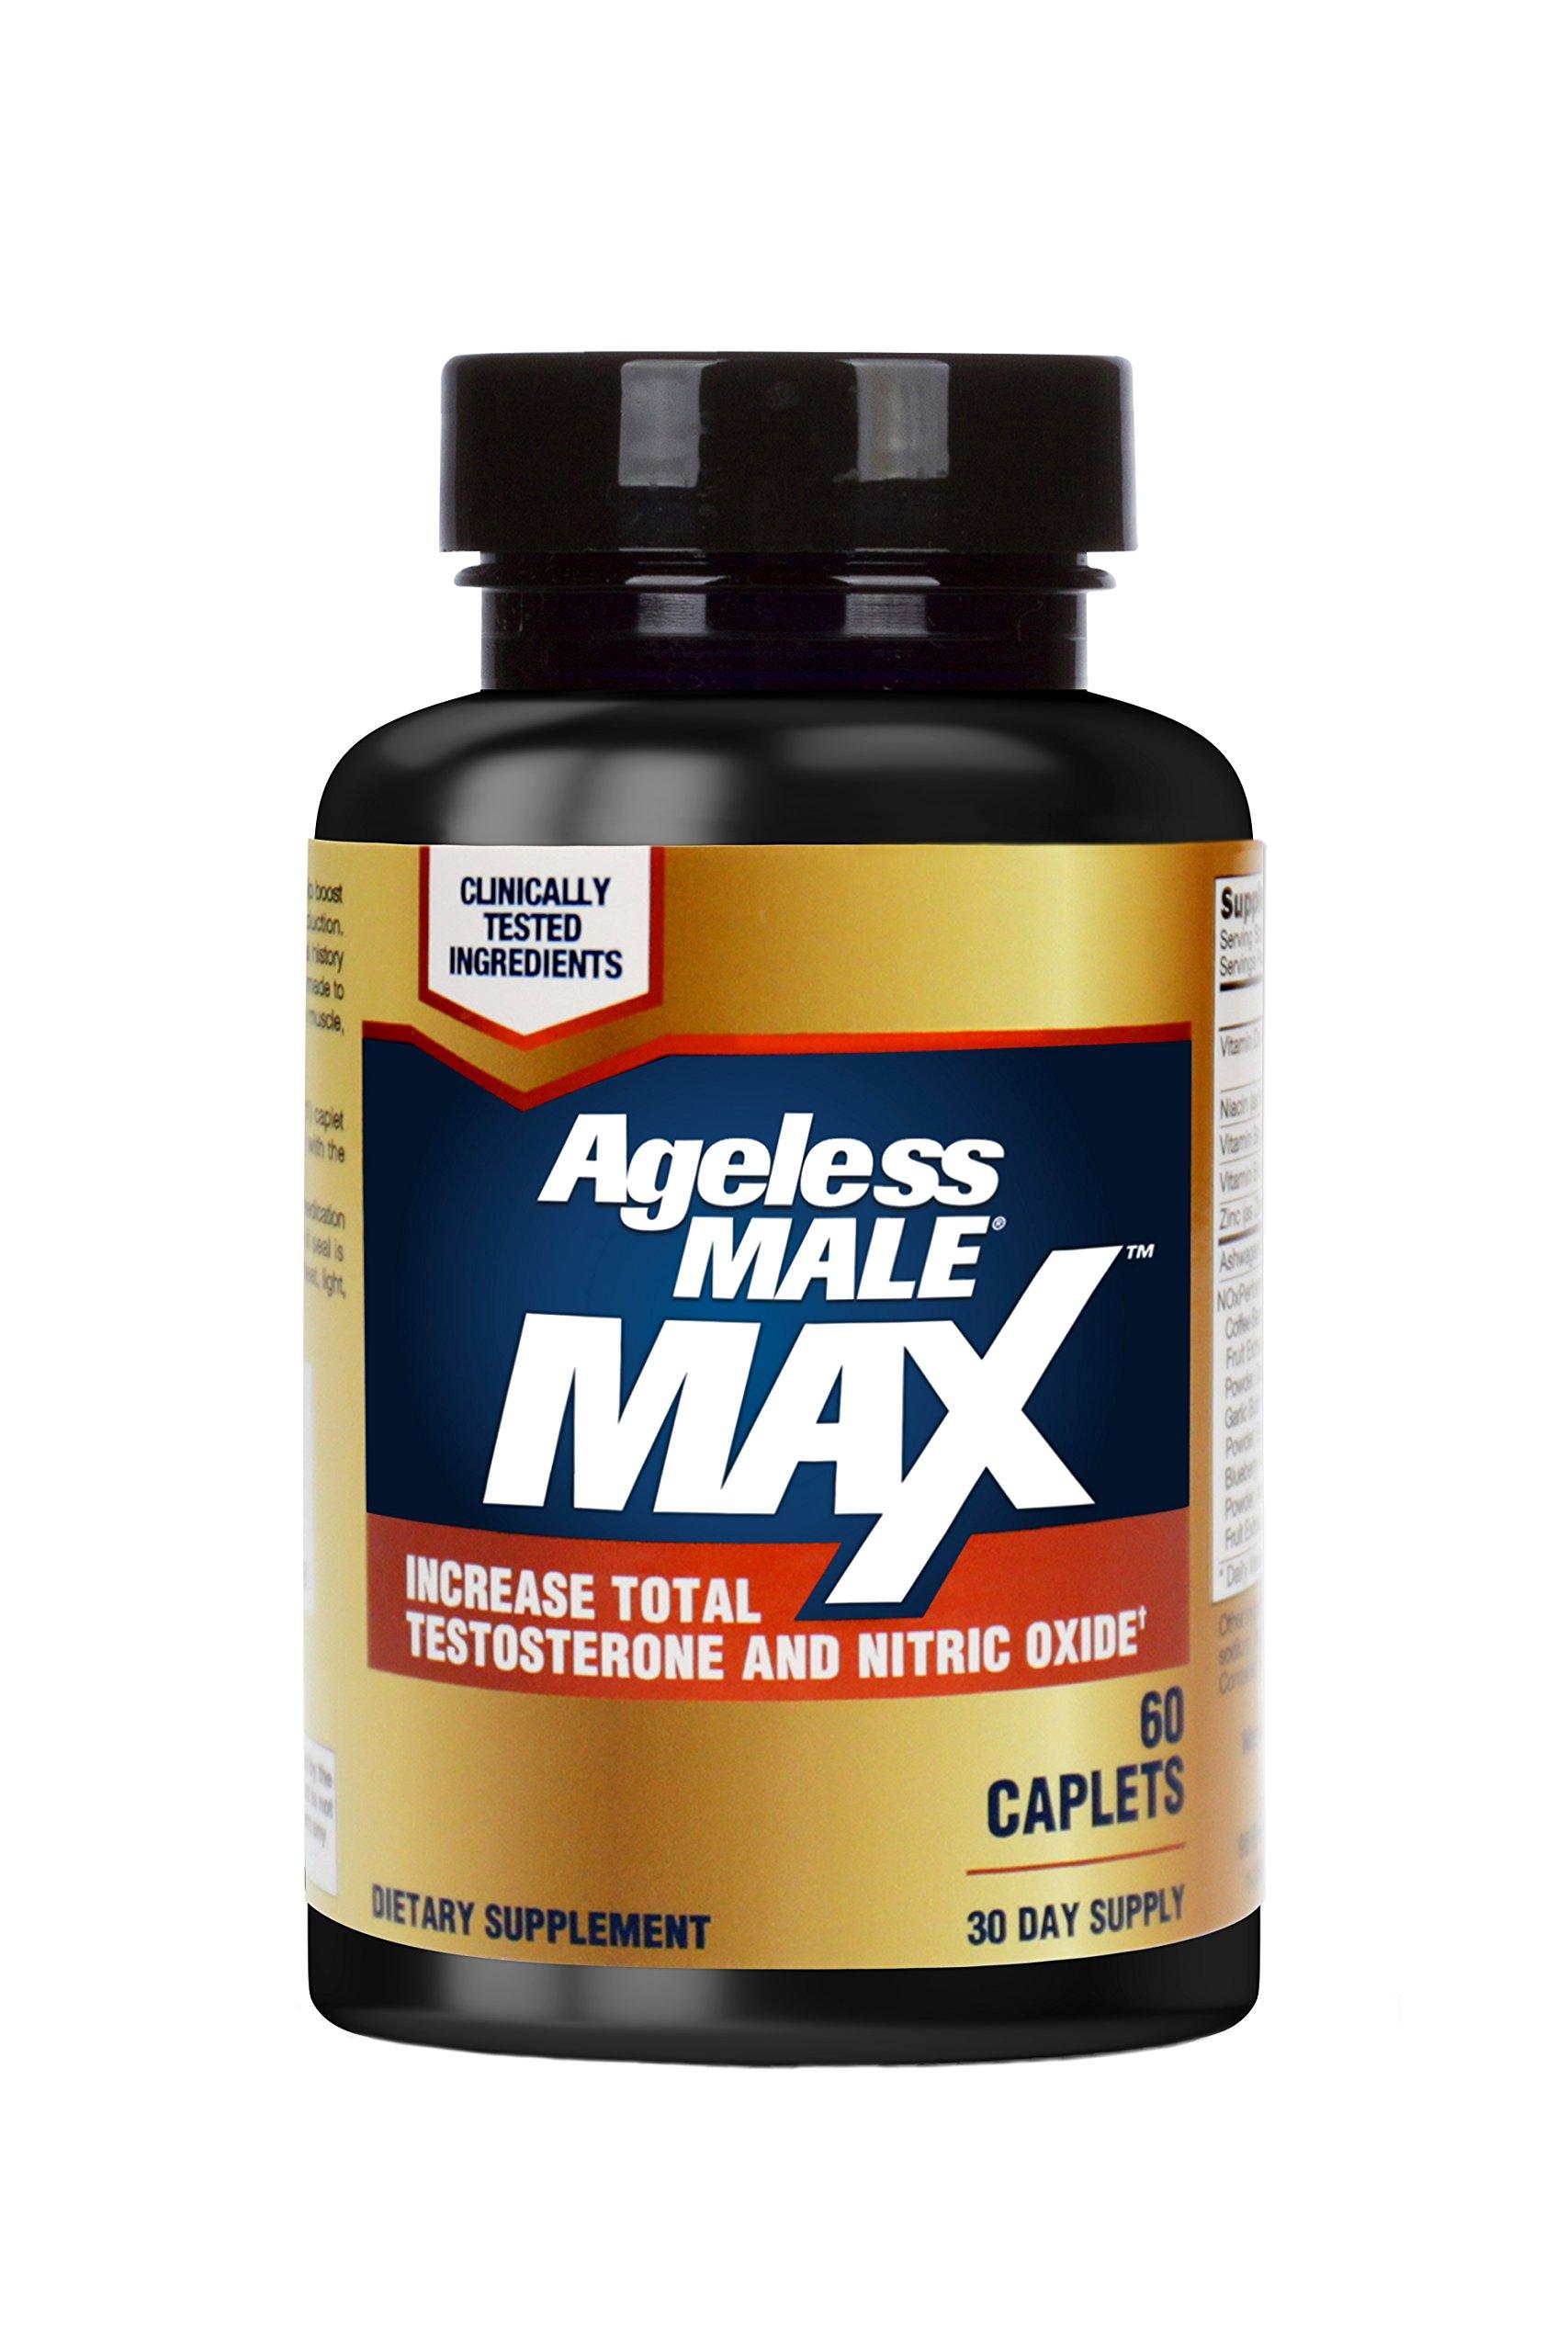 Malemax sexual performance pills